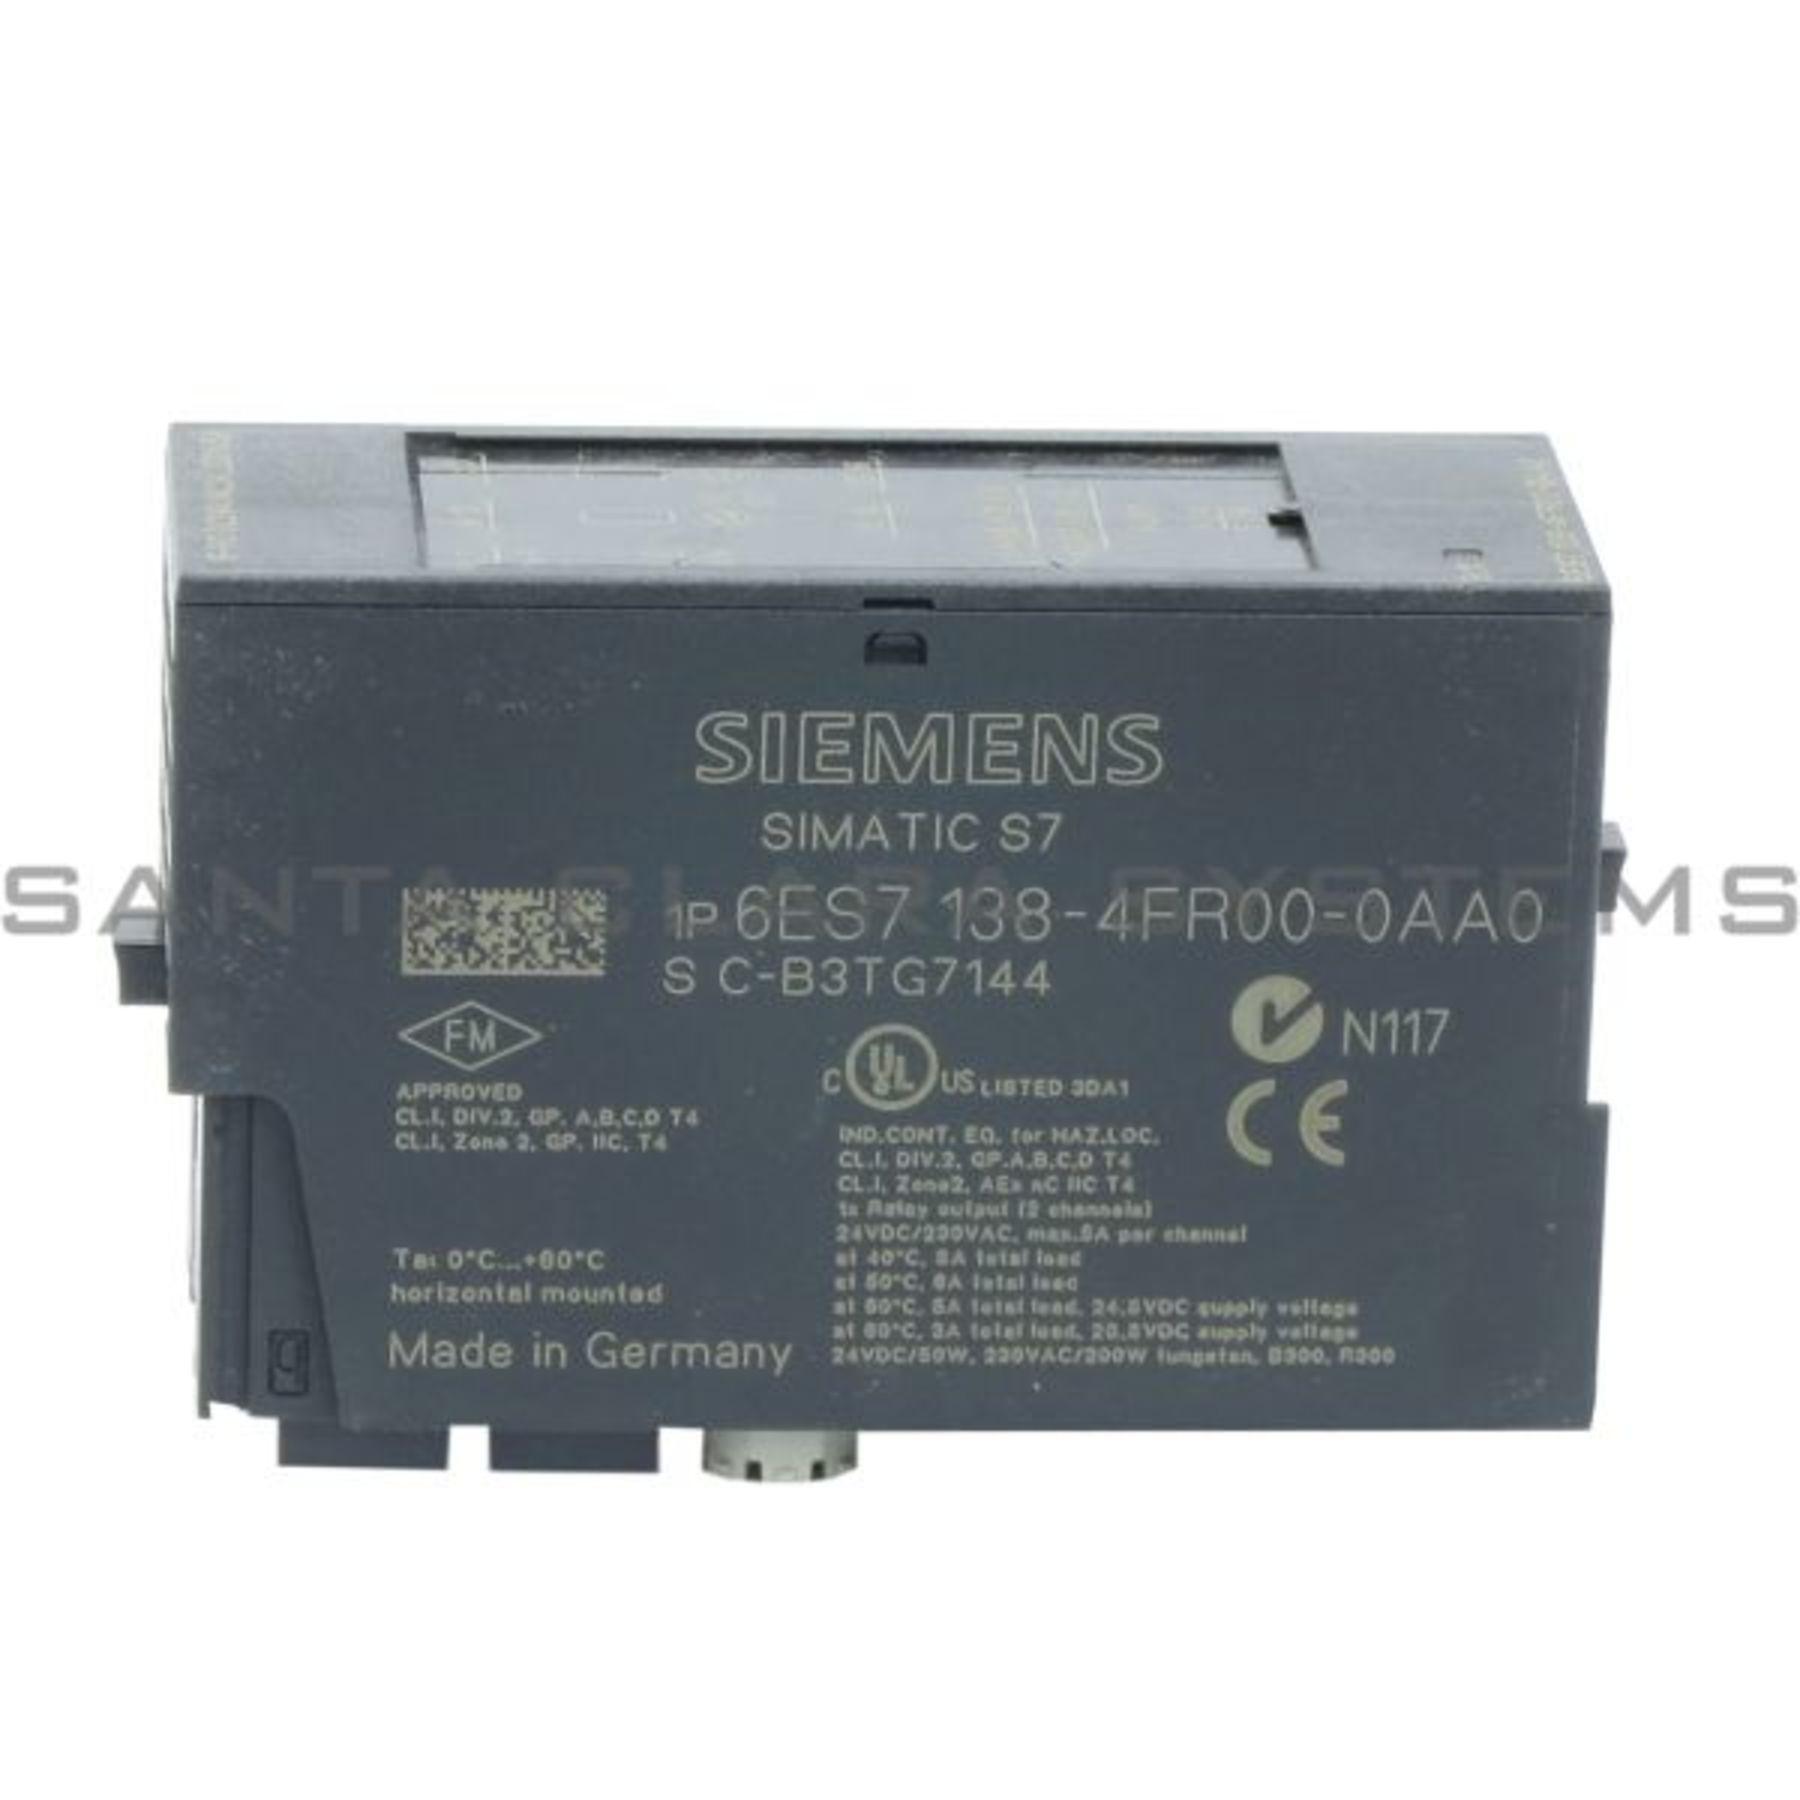 6es7138 4fr00 0aa0 Relay Output Module Et200s 6es7138 4fr00 0aa0